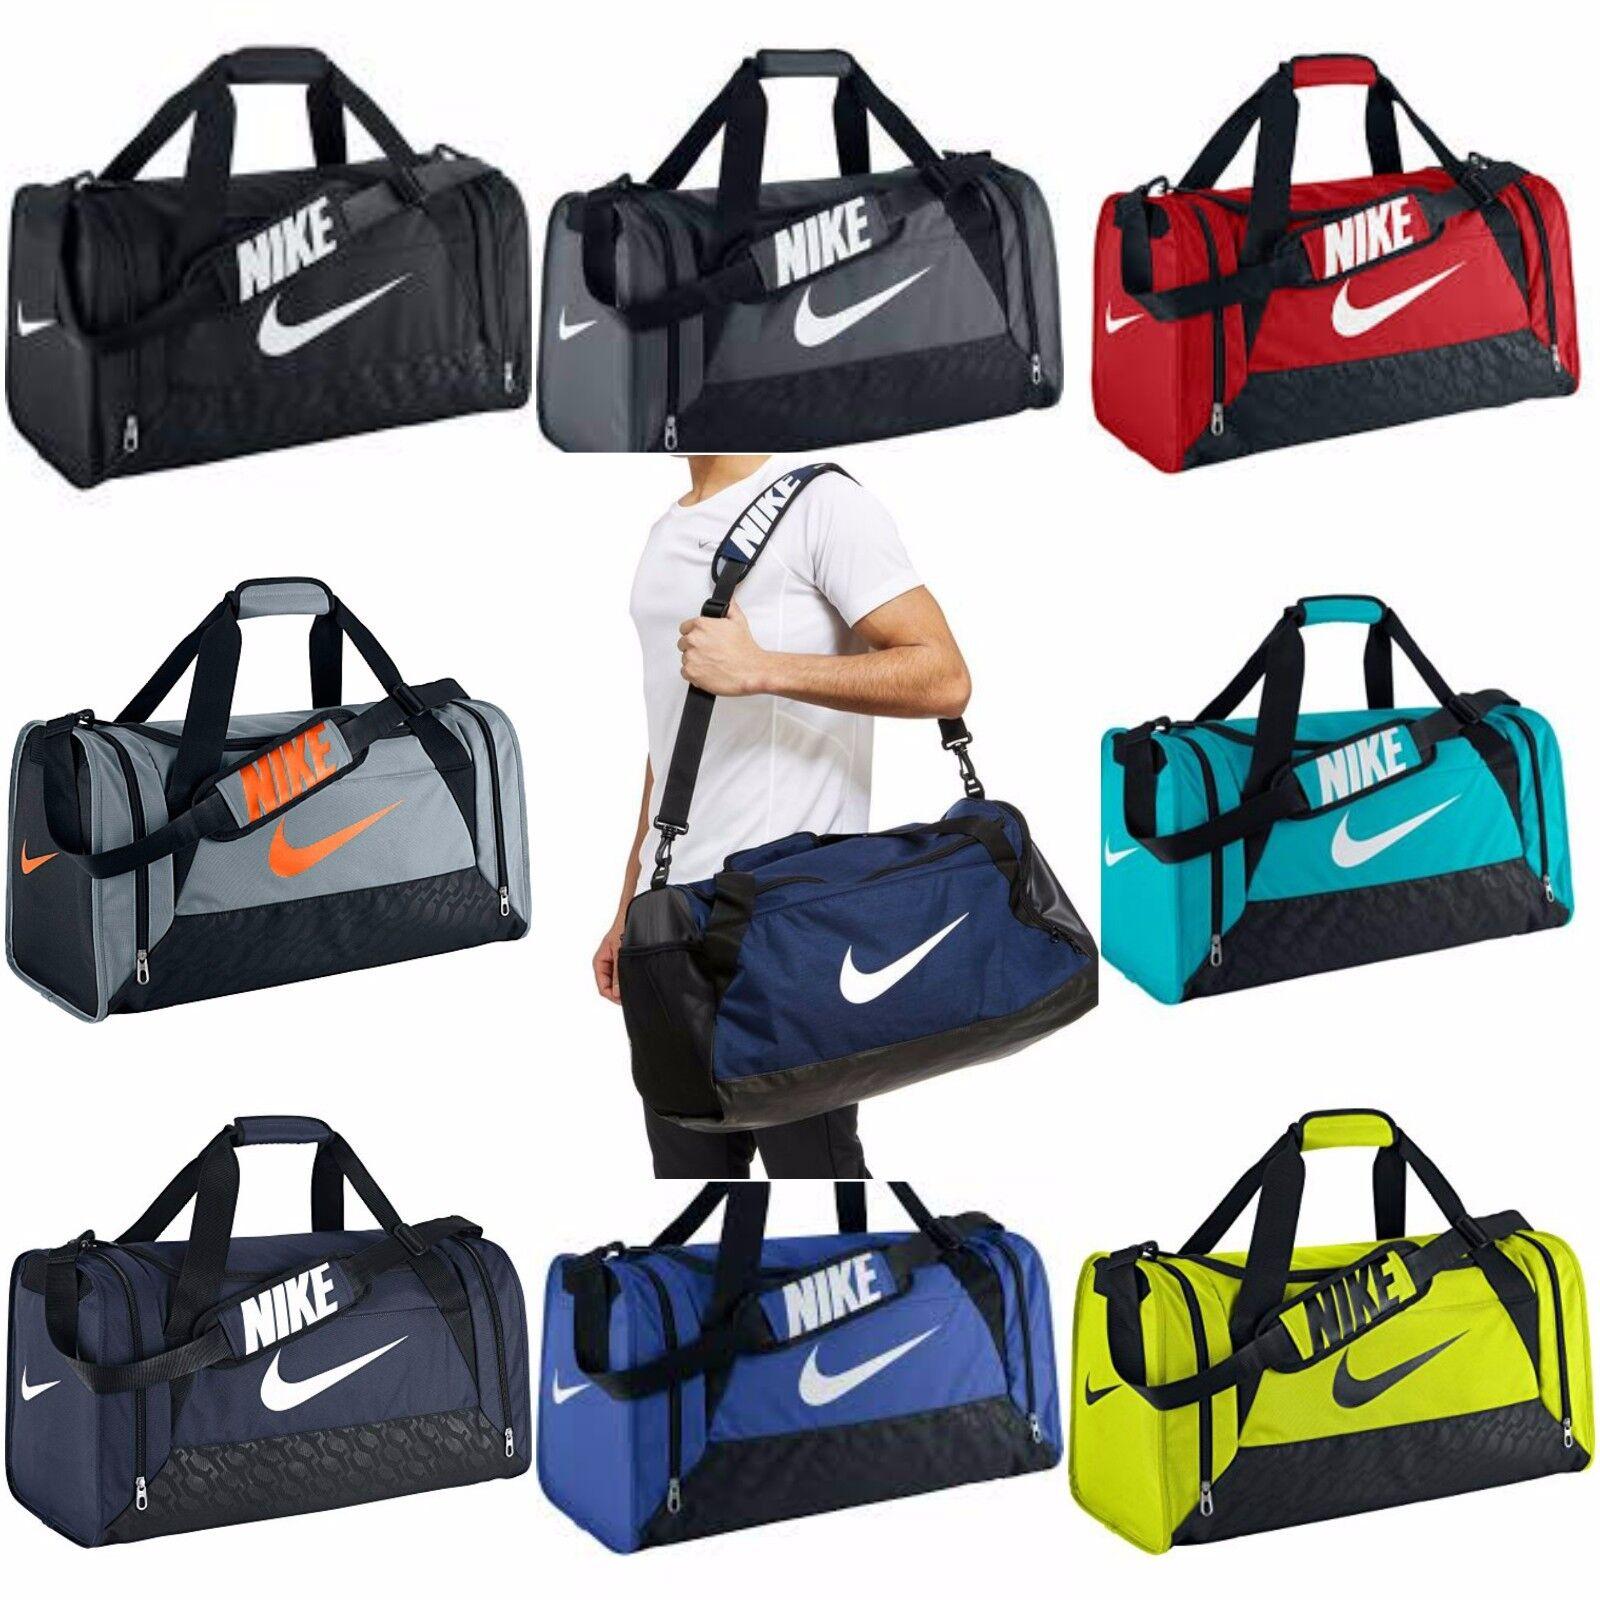 vida Mujer joven melodía  Nike Brasilia 6 Medium Duffel Bag Royal Blue Black Ba4829 411 for sale  online | eBay